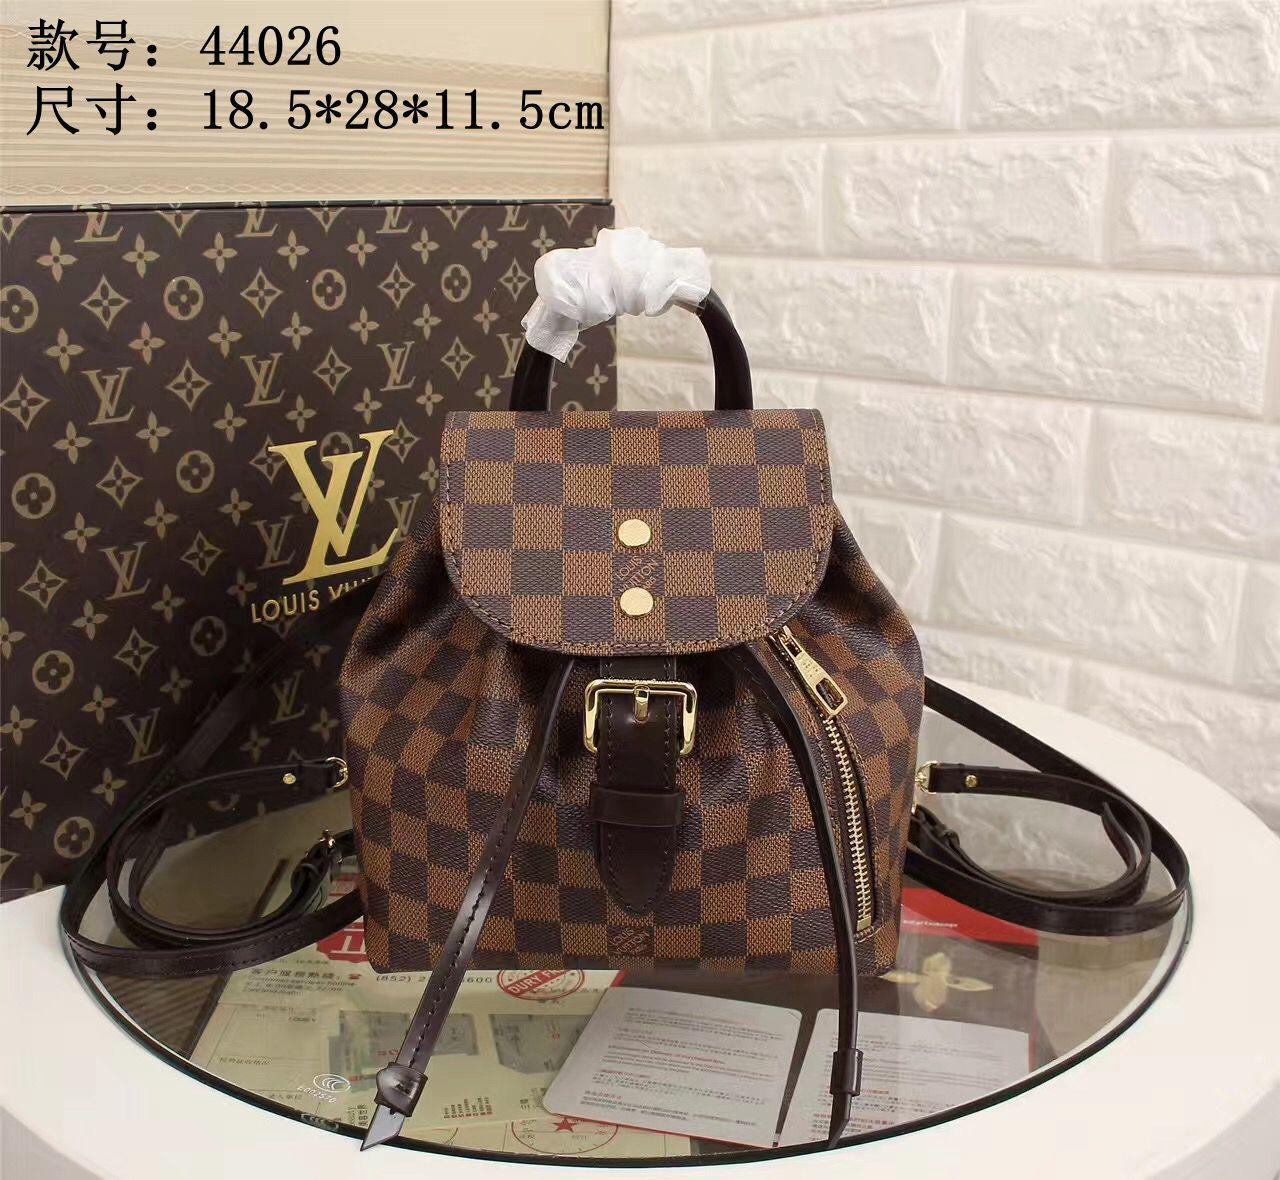 Buy cheap wholesale 2018 new bags handbags LV Bag LV Handbag Belt LV Purse from Wholesalers